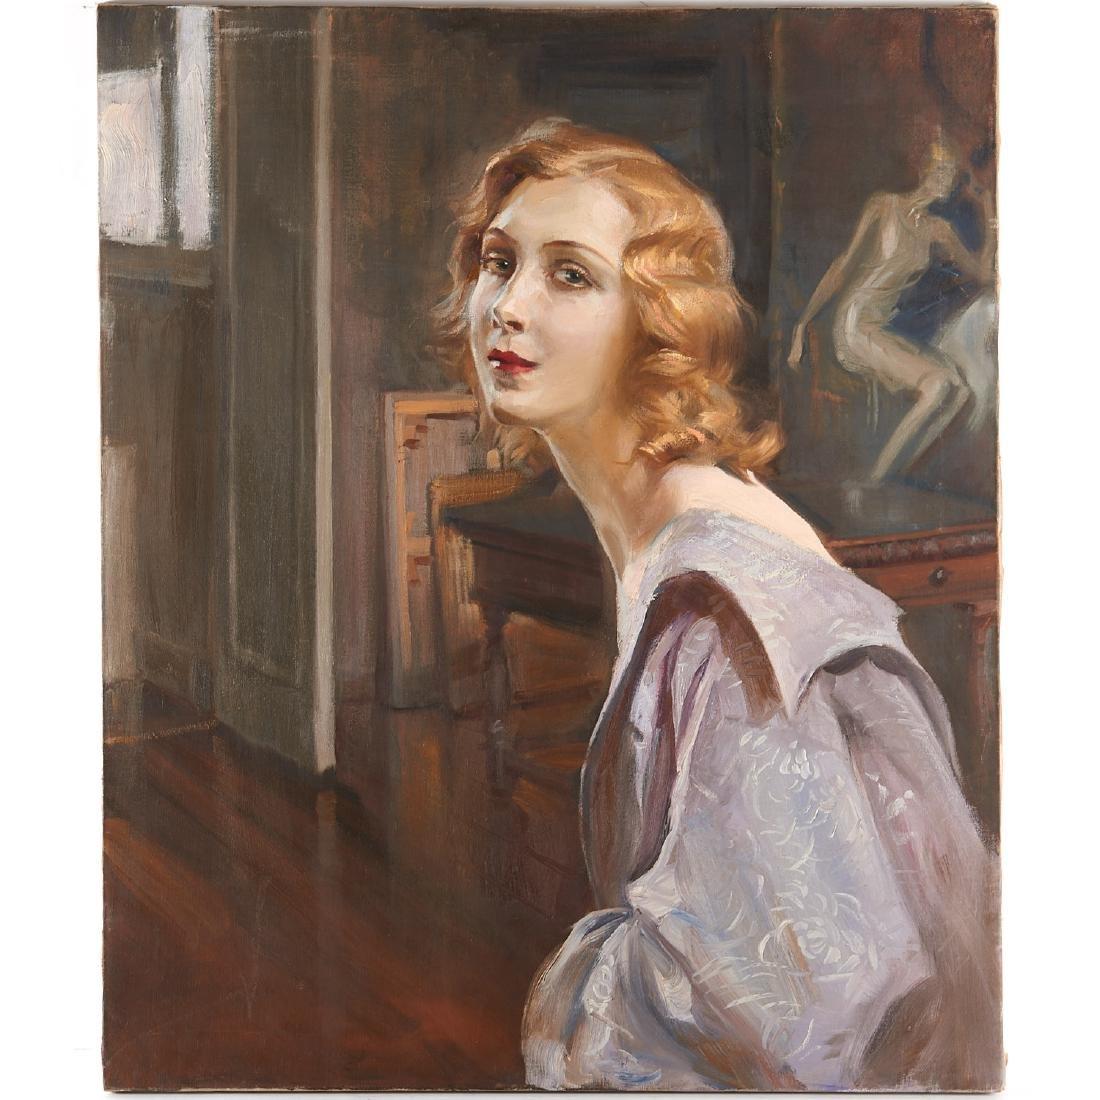 Huguette Clark (attrib.), portrait painting